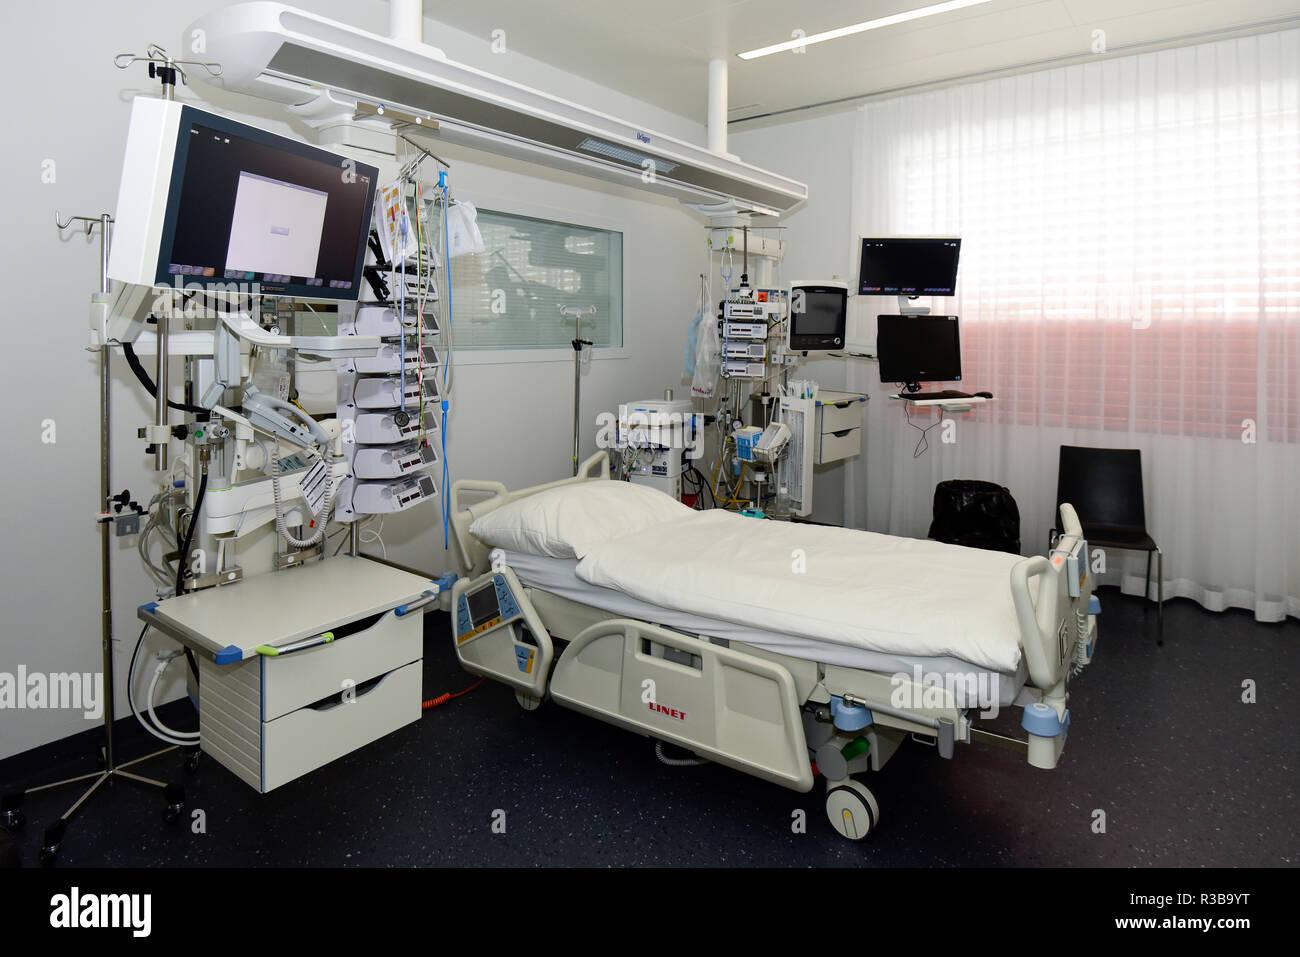 Intensive care single room, Switzerland - Stock Image